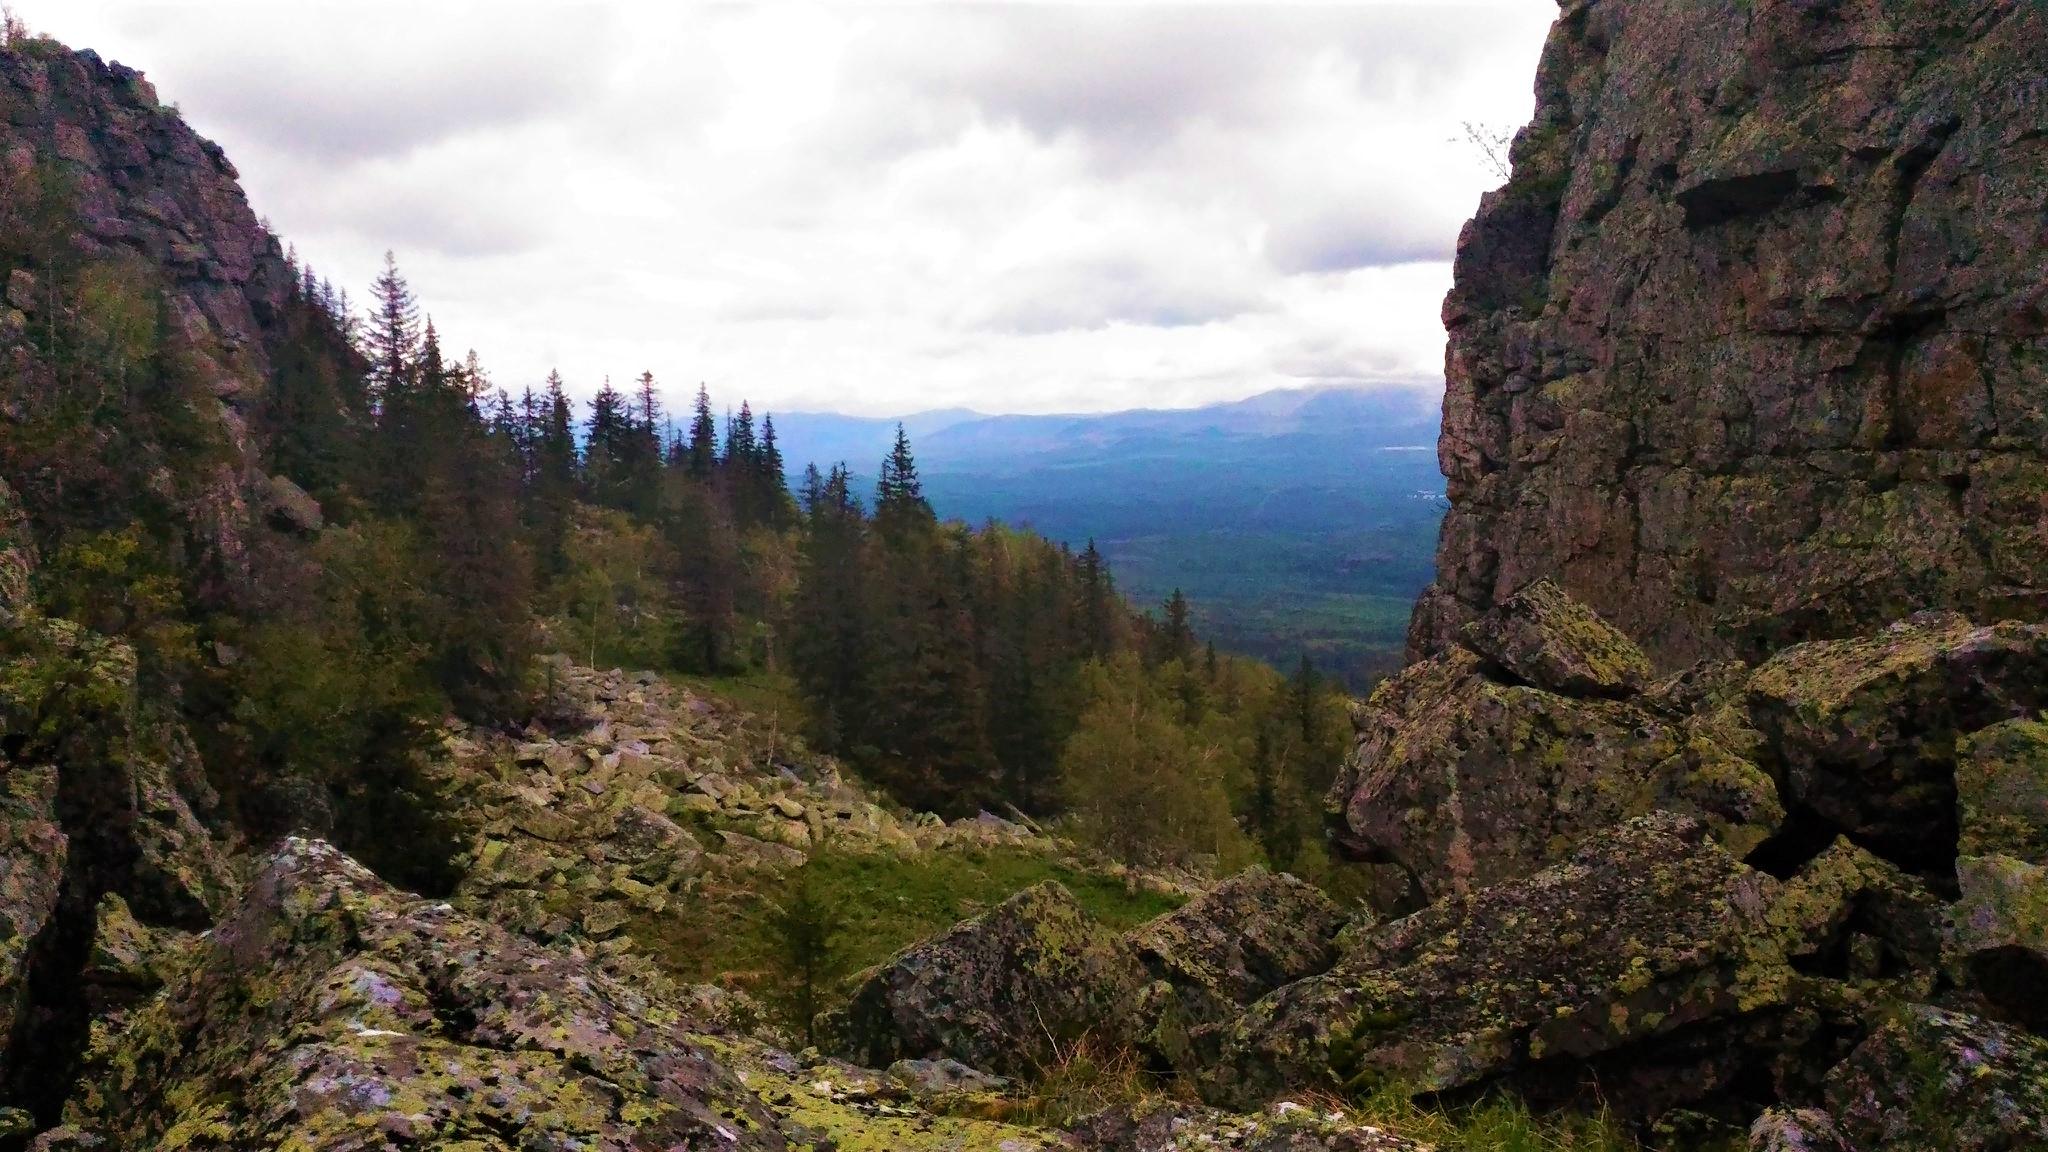 Хребет Нары, Башкортостан, Южный Урал